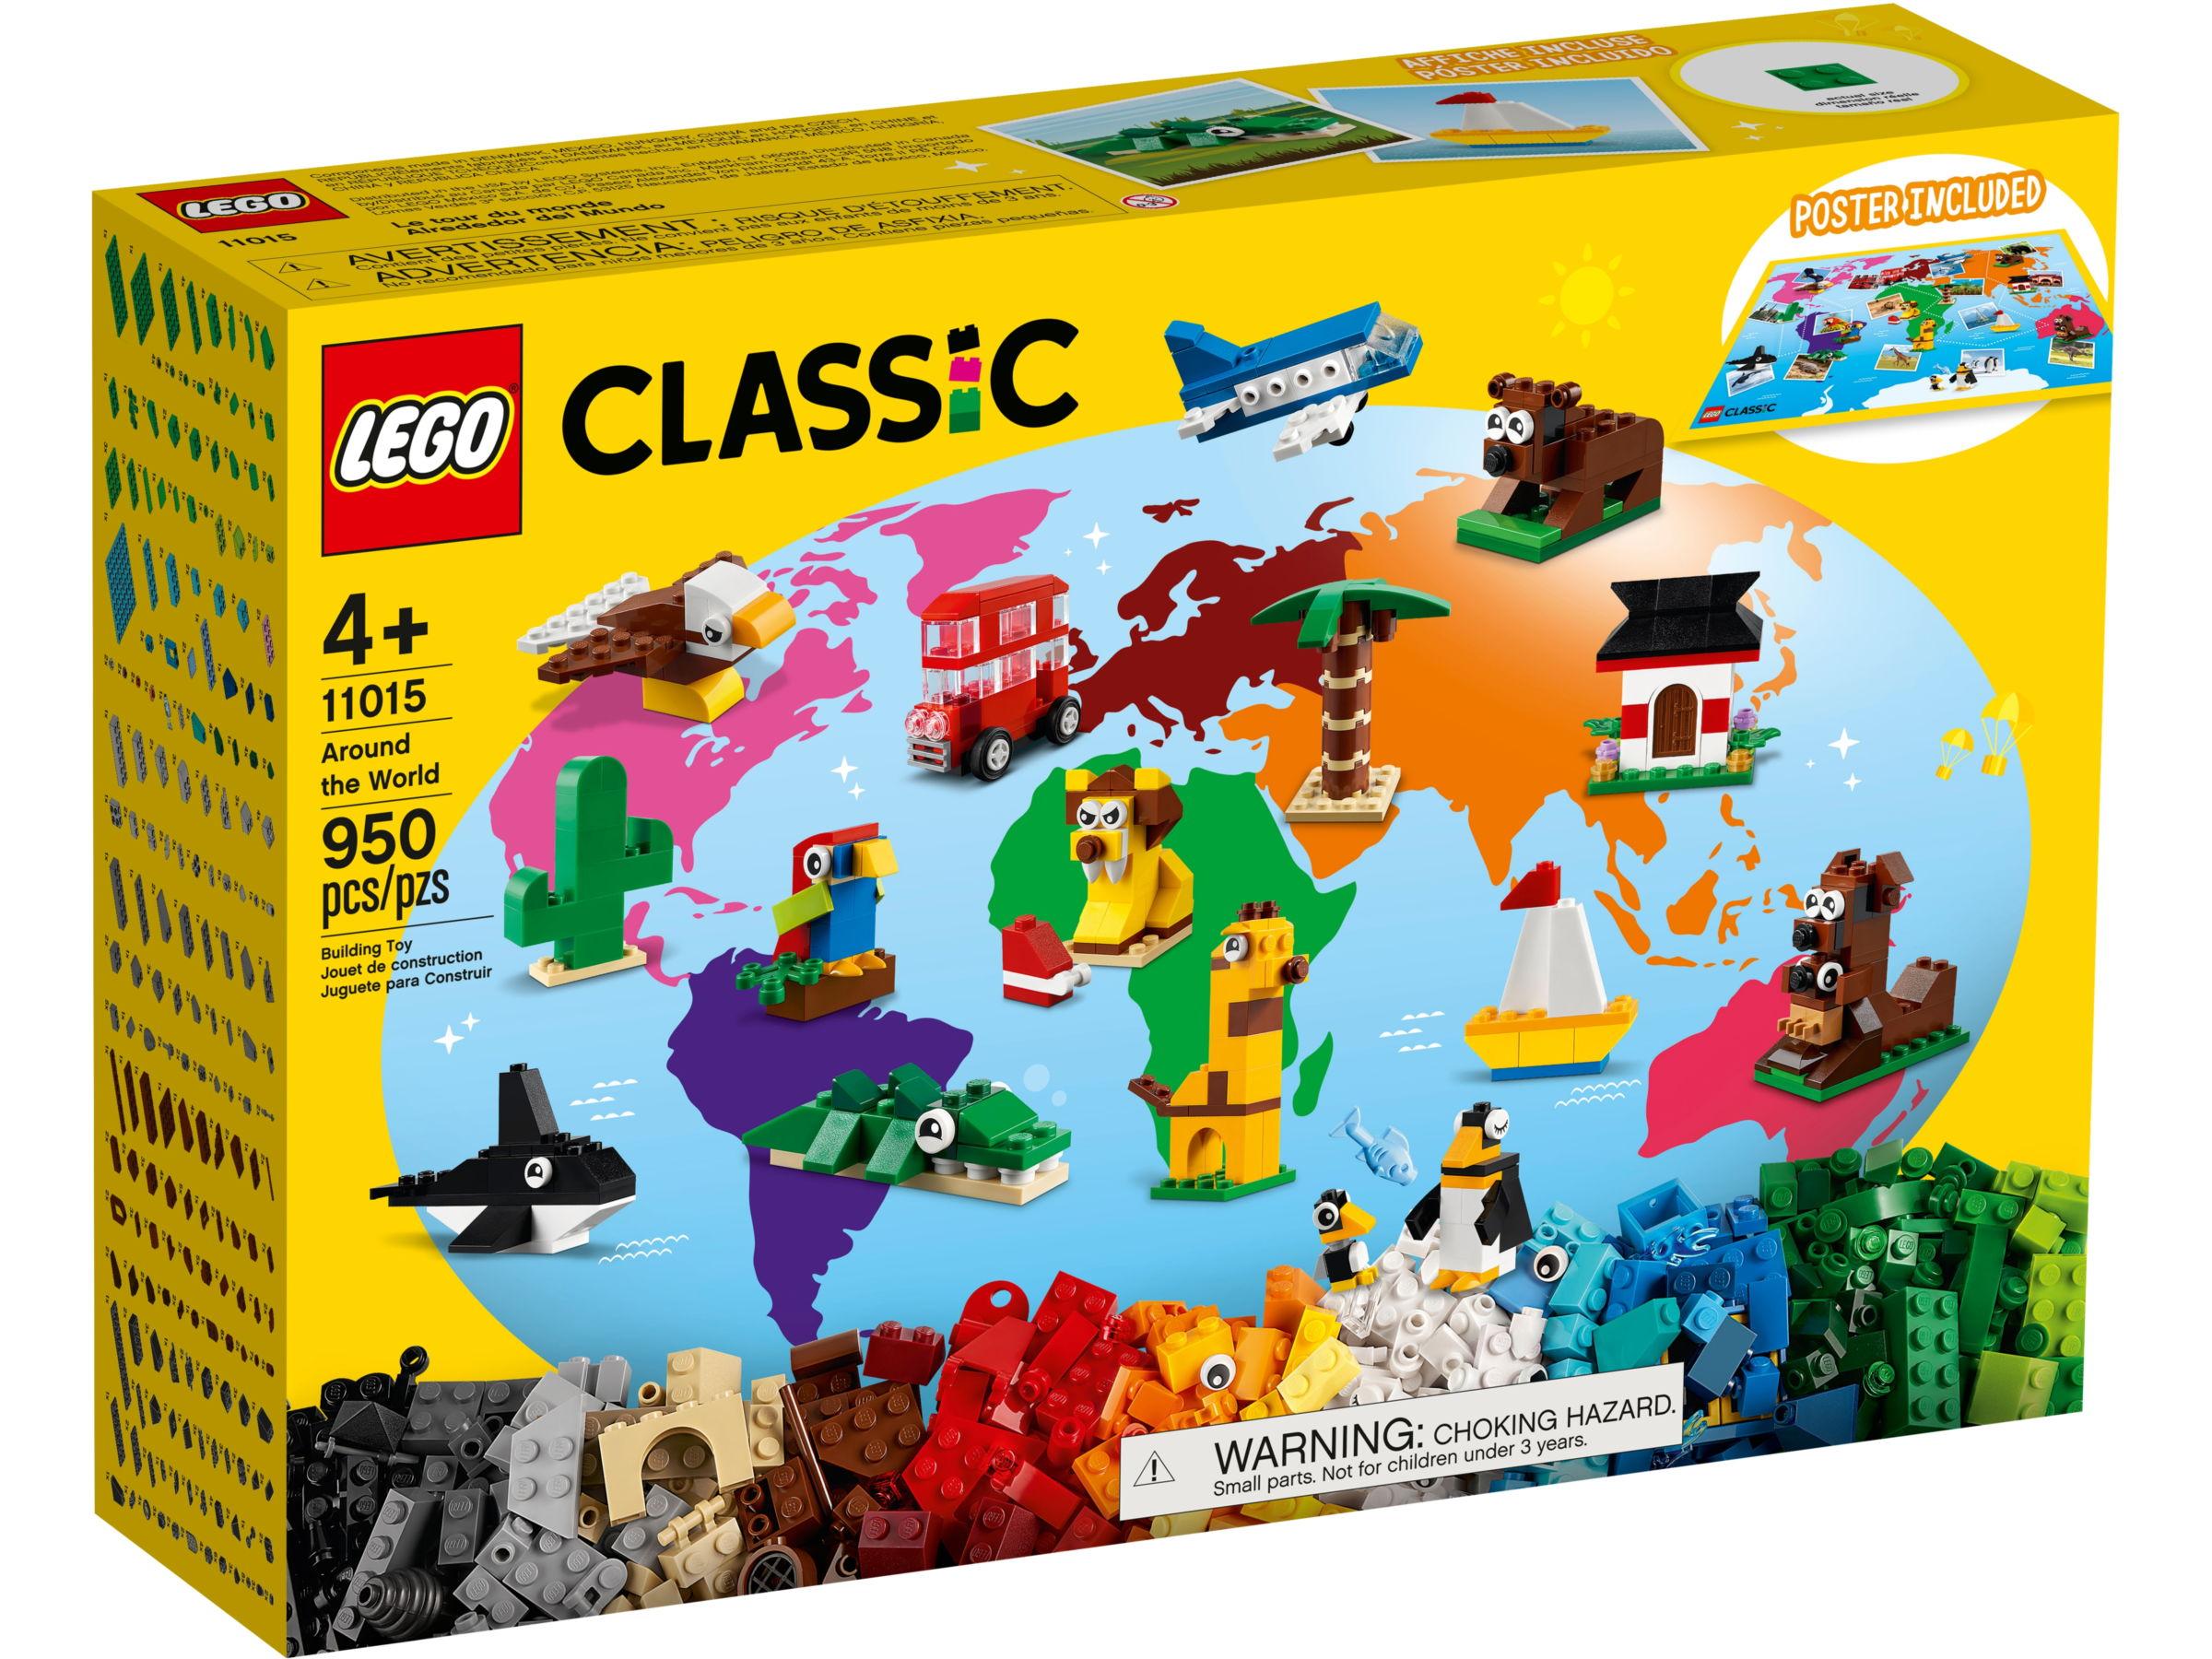 LEGO Classic 11015 Rond de wereld